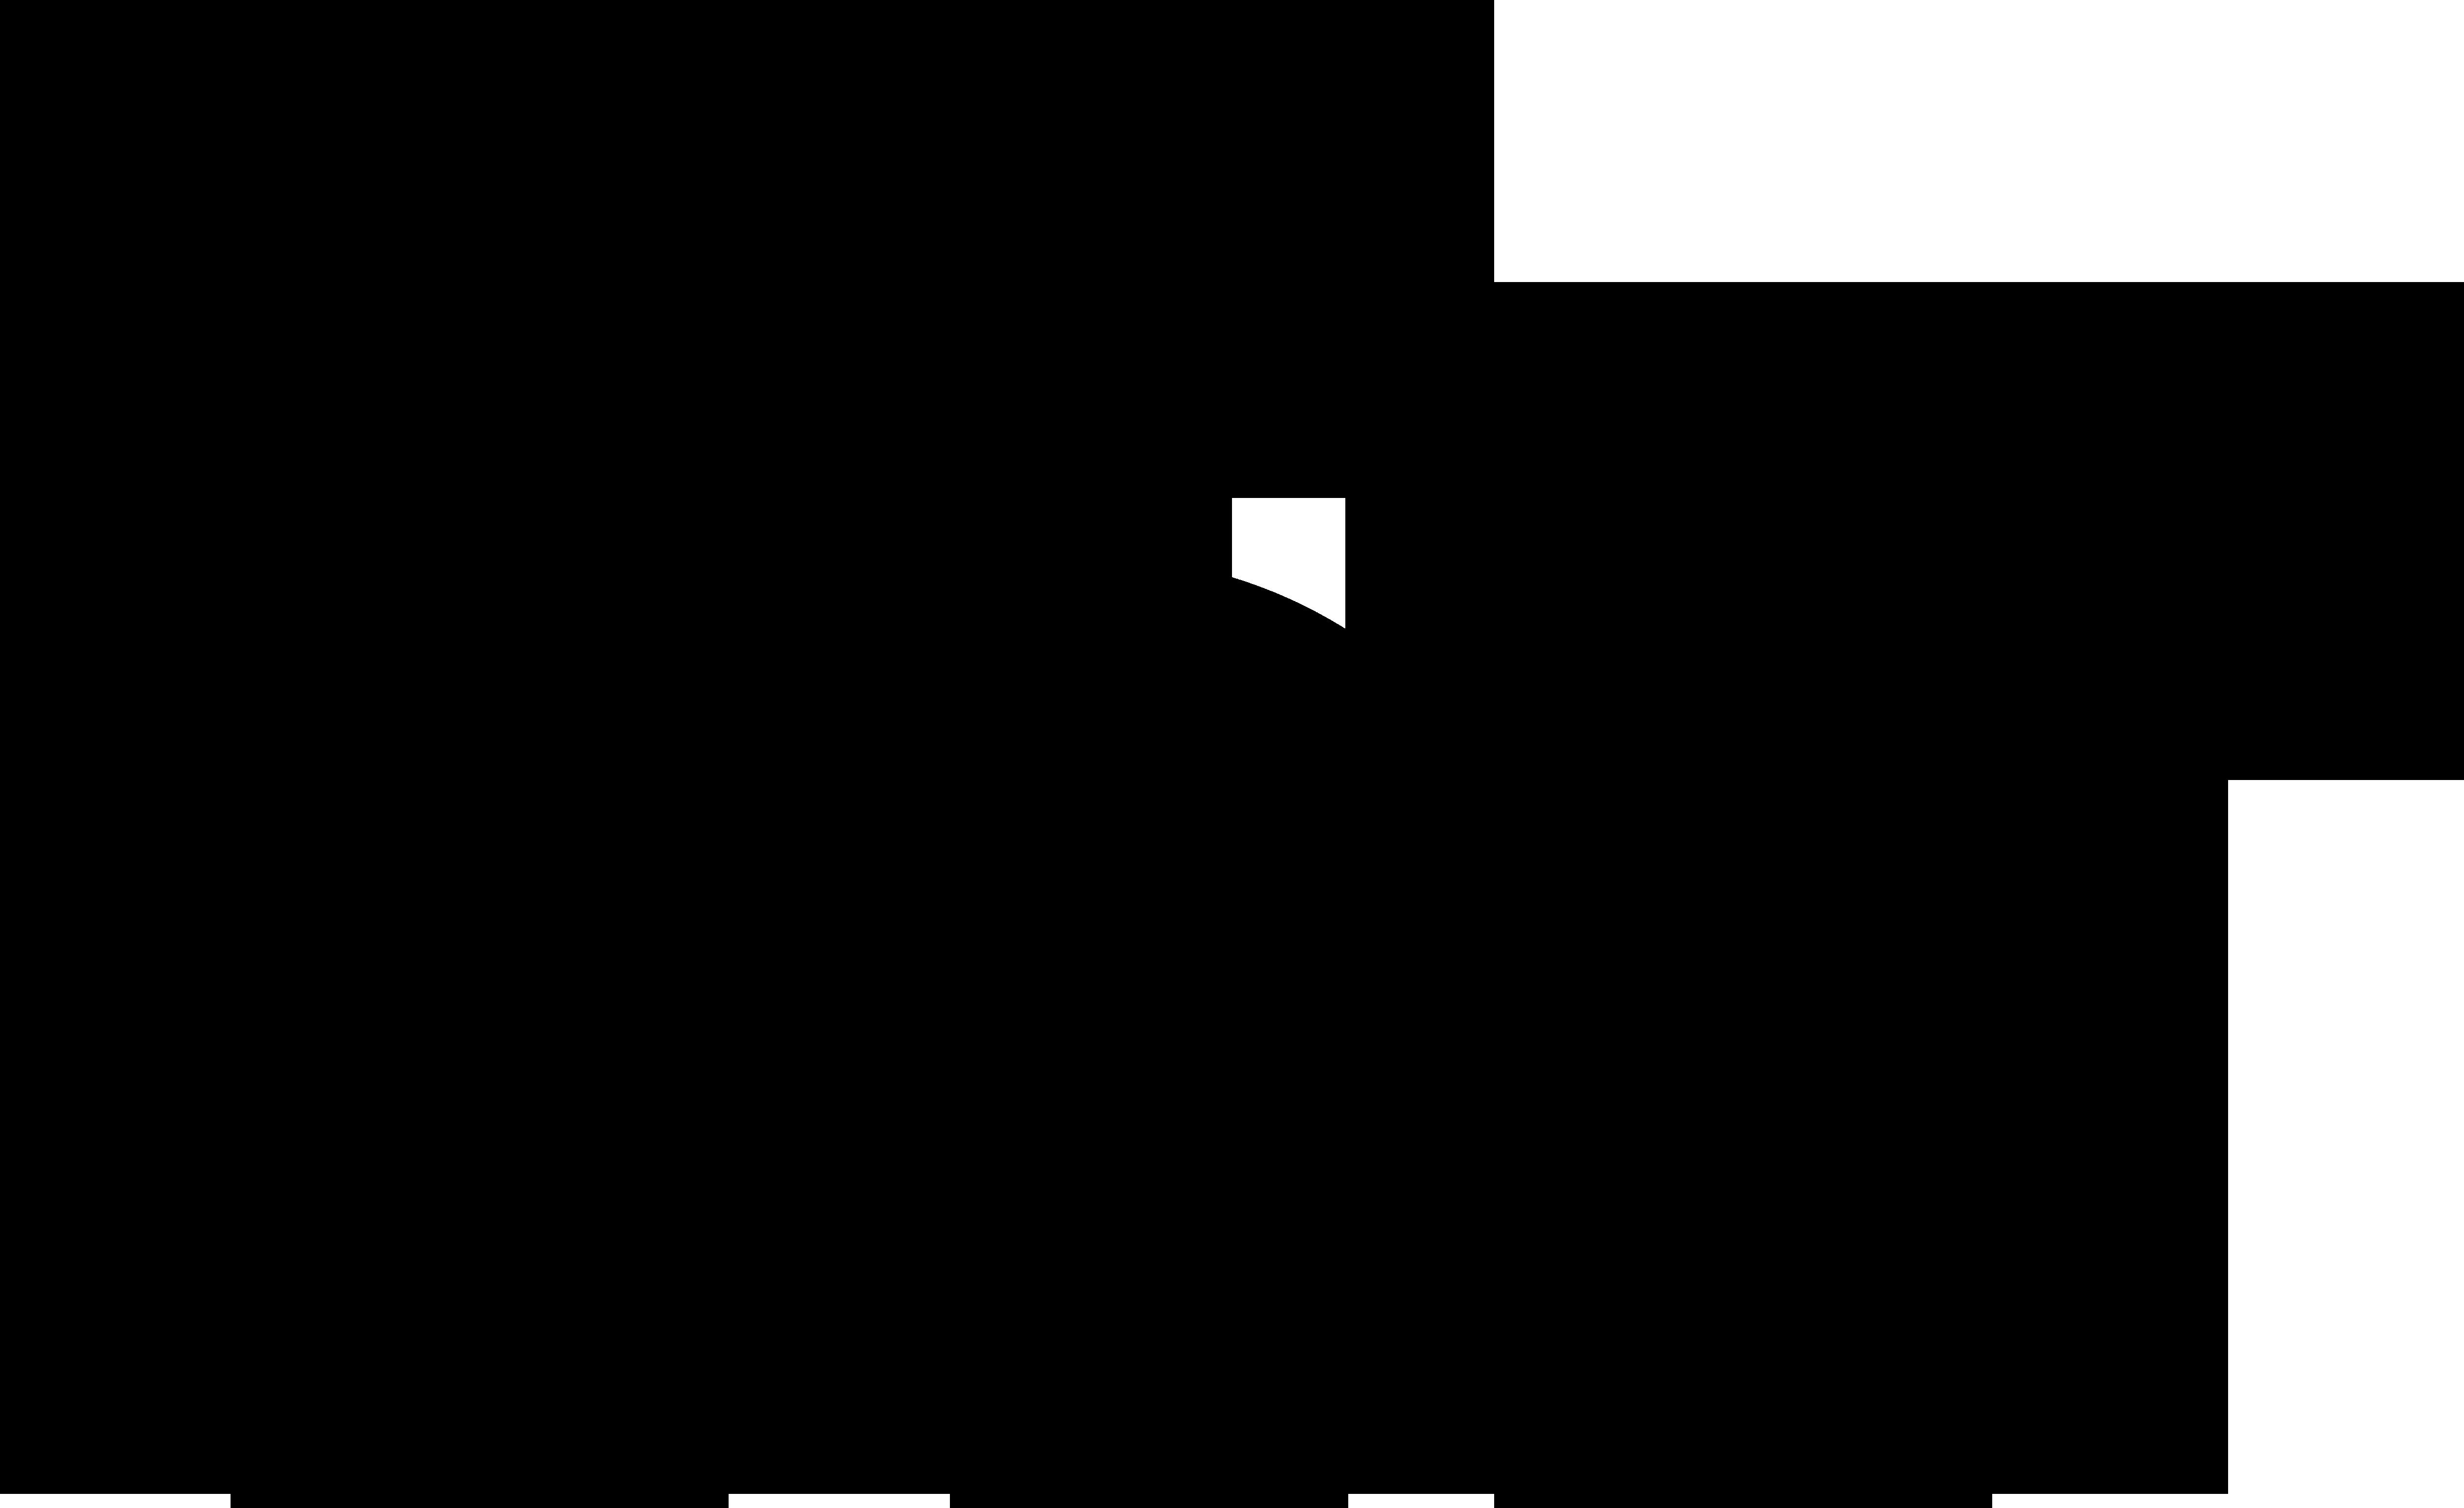 Nonbinary symbol interlocked with a nonbinary symbol and a Mars symbol.